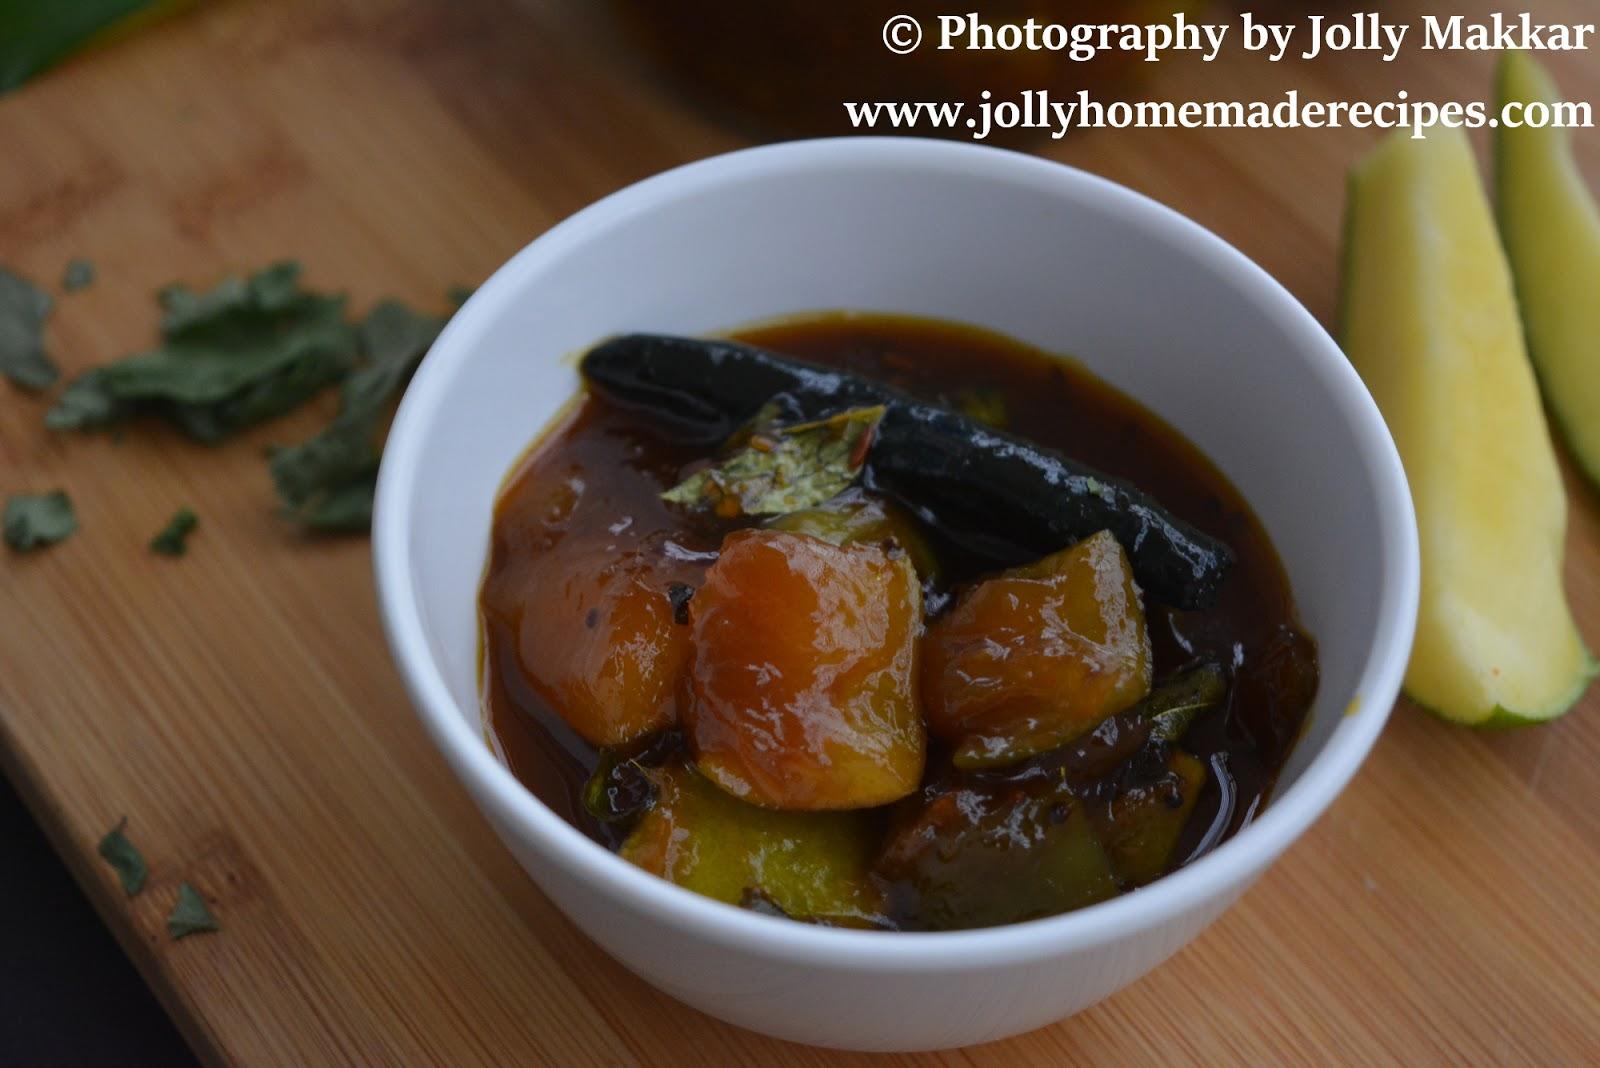 Odia style Swee and Sour mango chutney